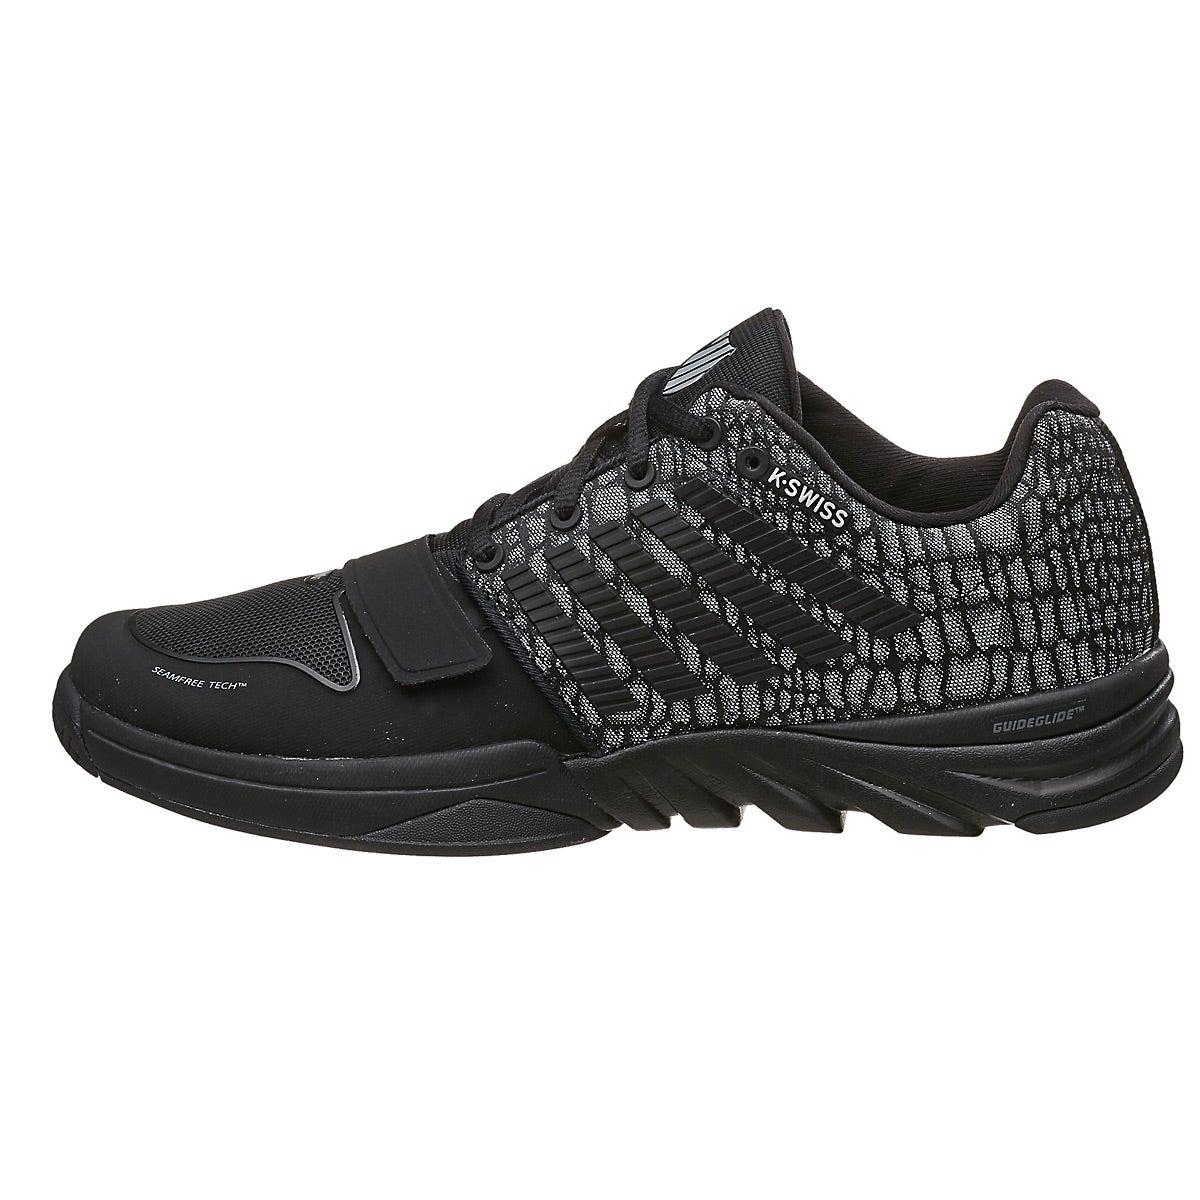 Kswiss Shoes Black